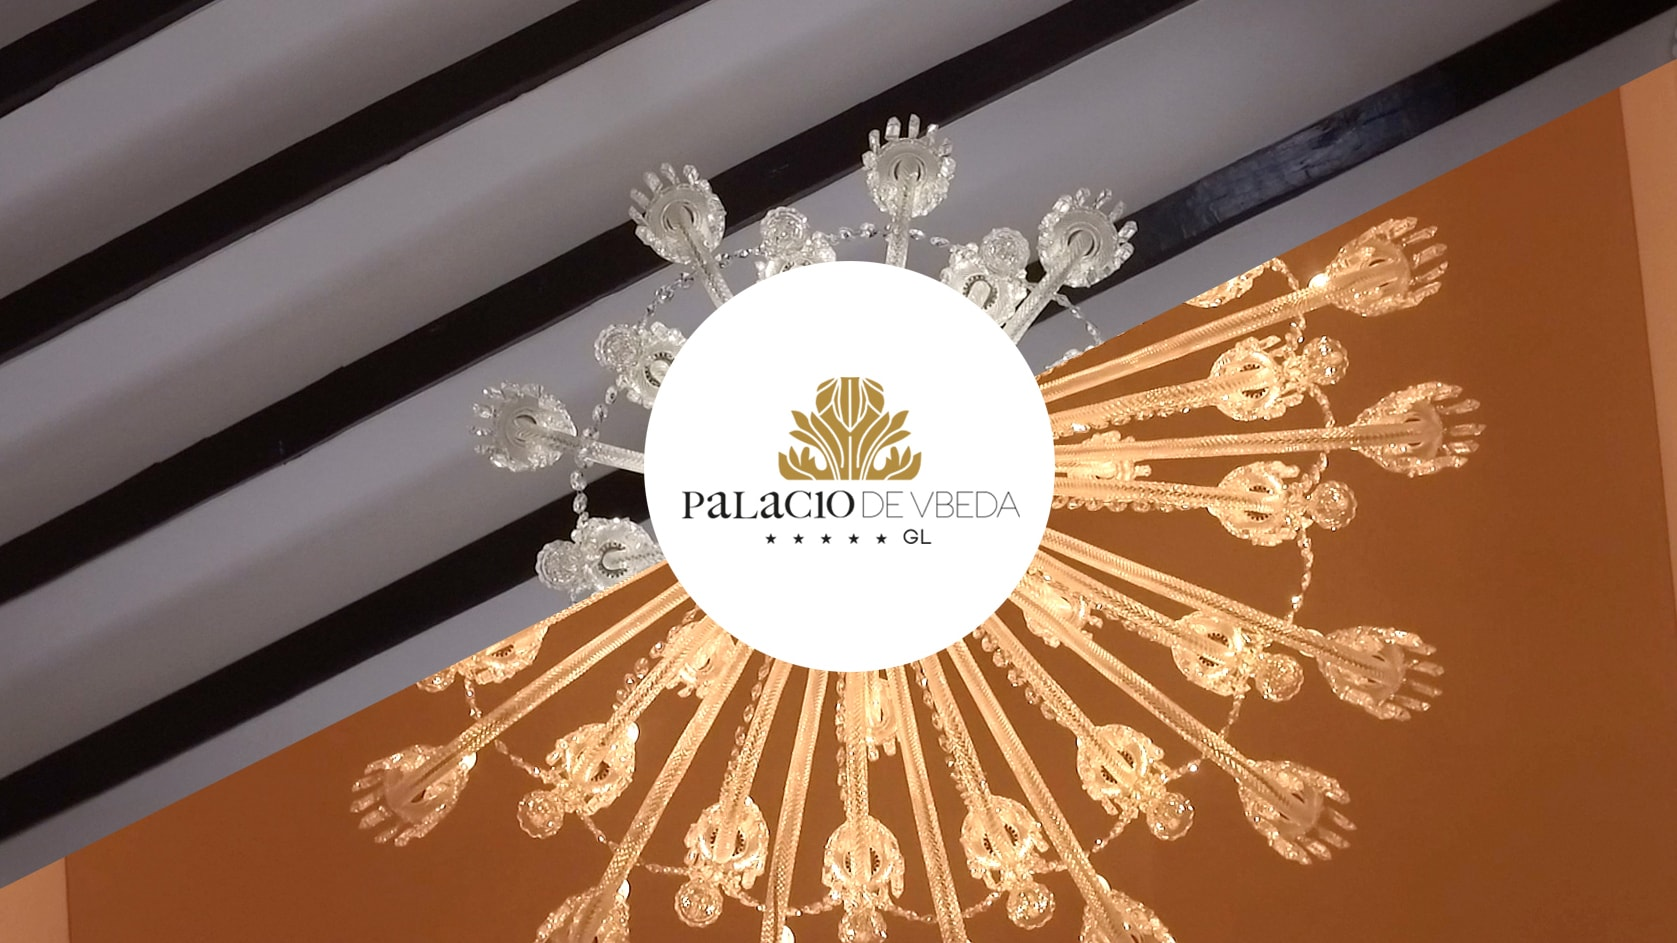 ubeda, palaciohotel, palacio, espagnehotel, espagnehotelluxe, hotelluxeespagne,